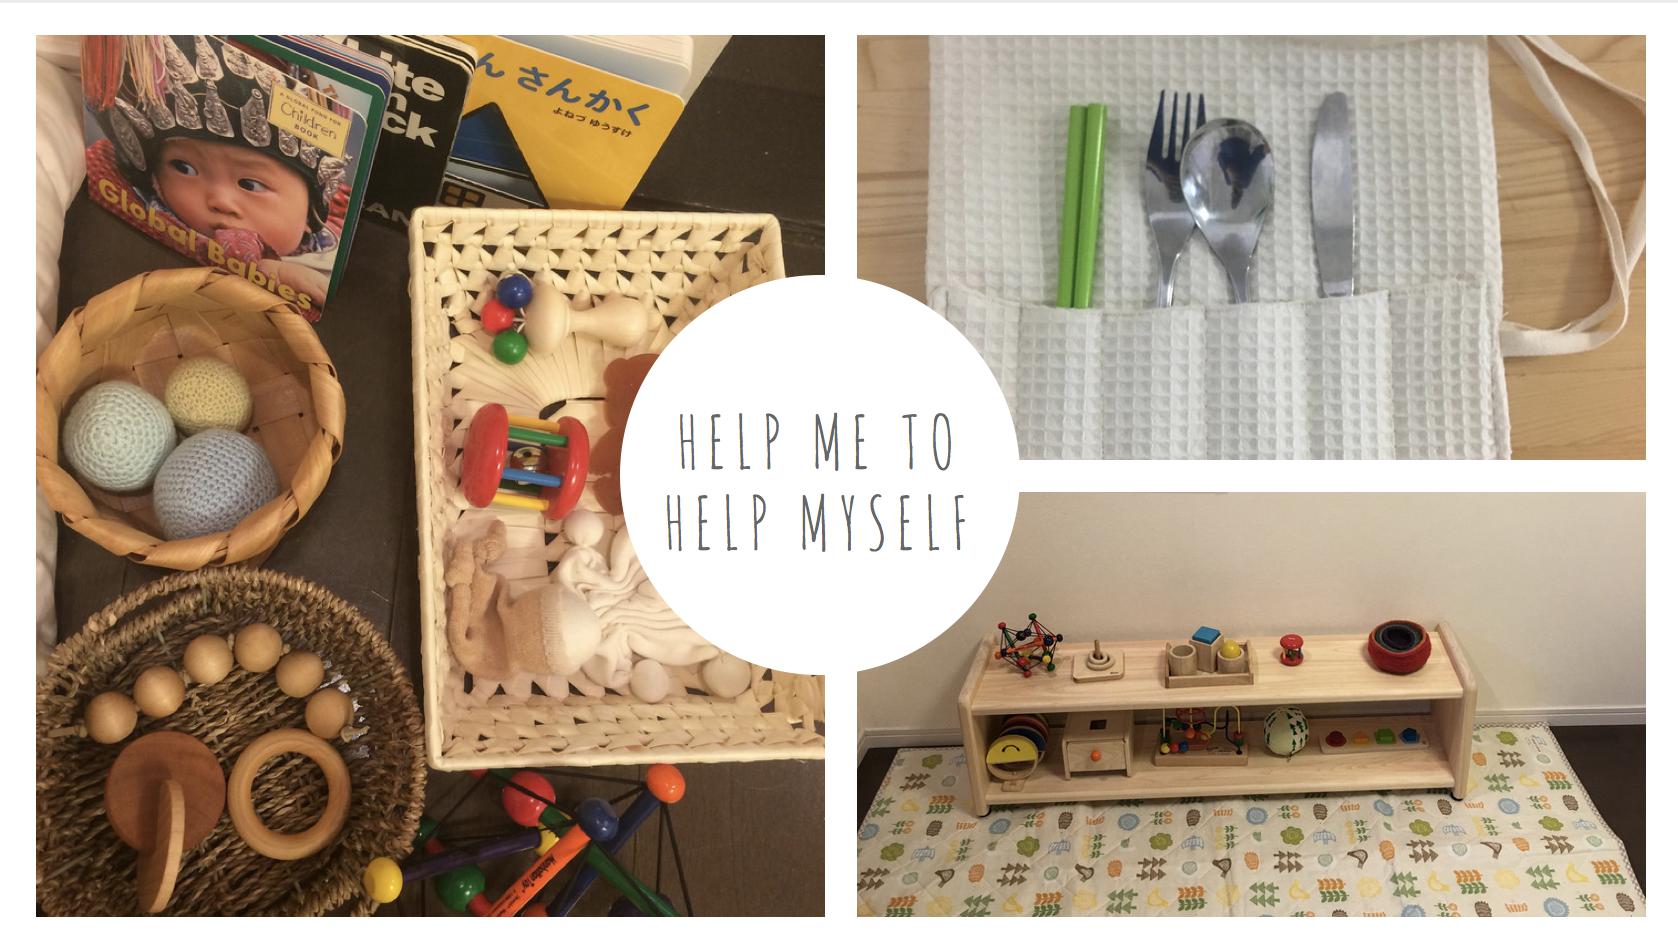 Help me to Help Myself